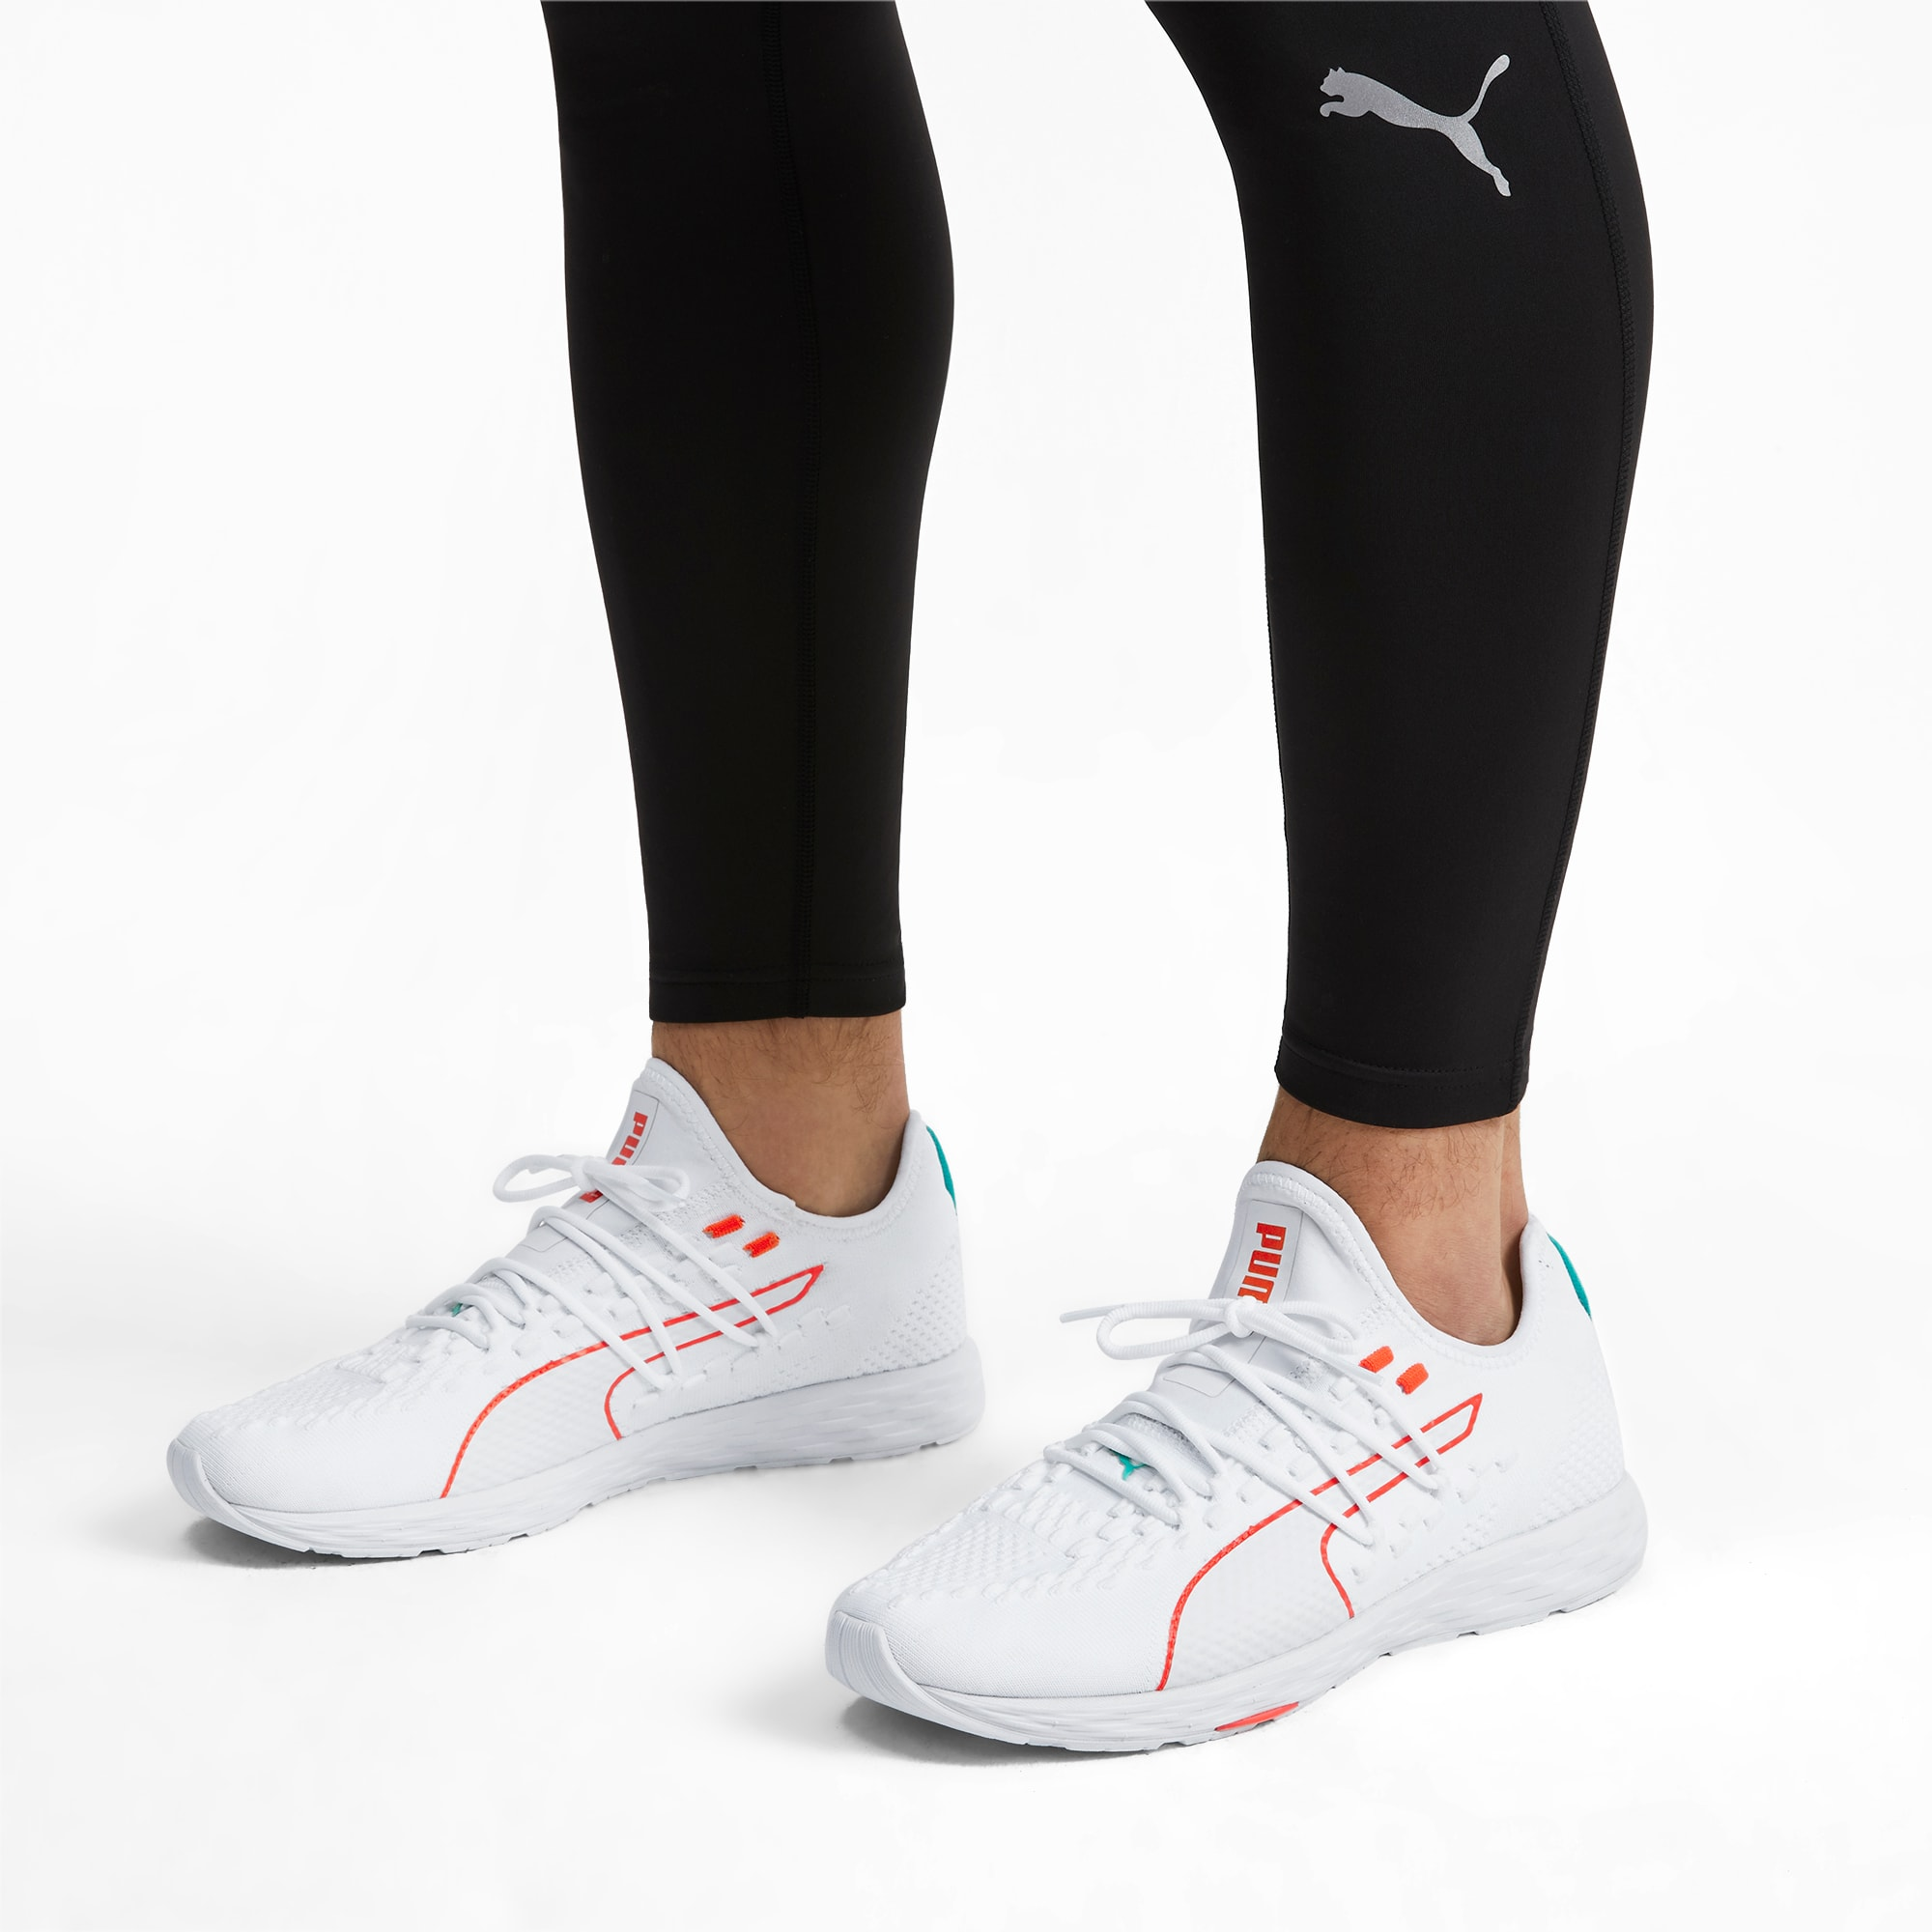 SPEED 300 RACER Men's Running Shoes